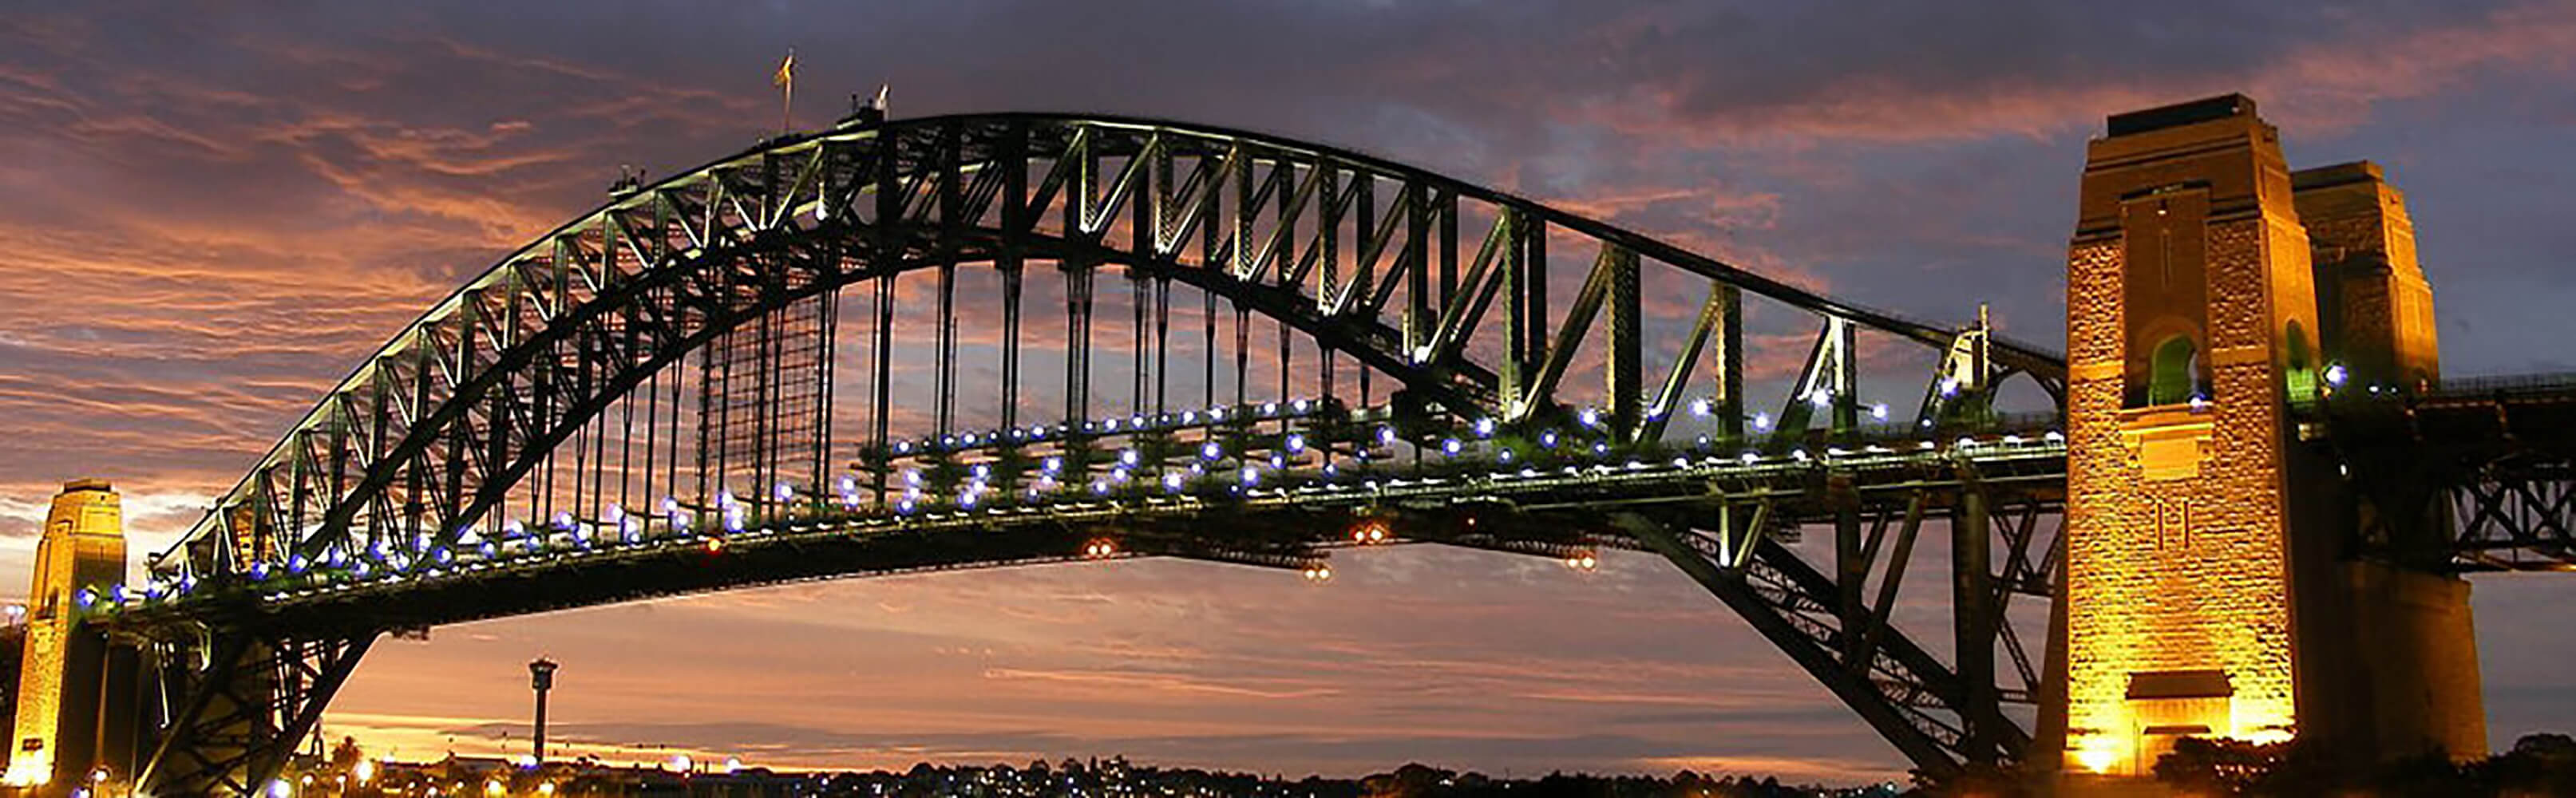 Sydney Harbour Bridge 1